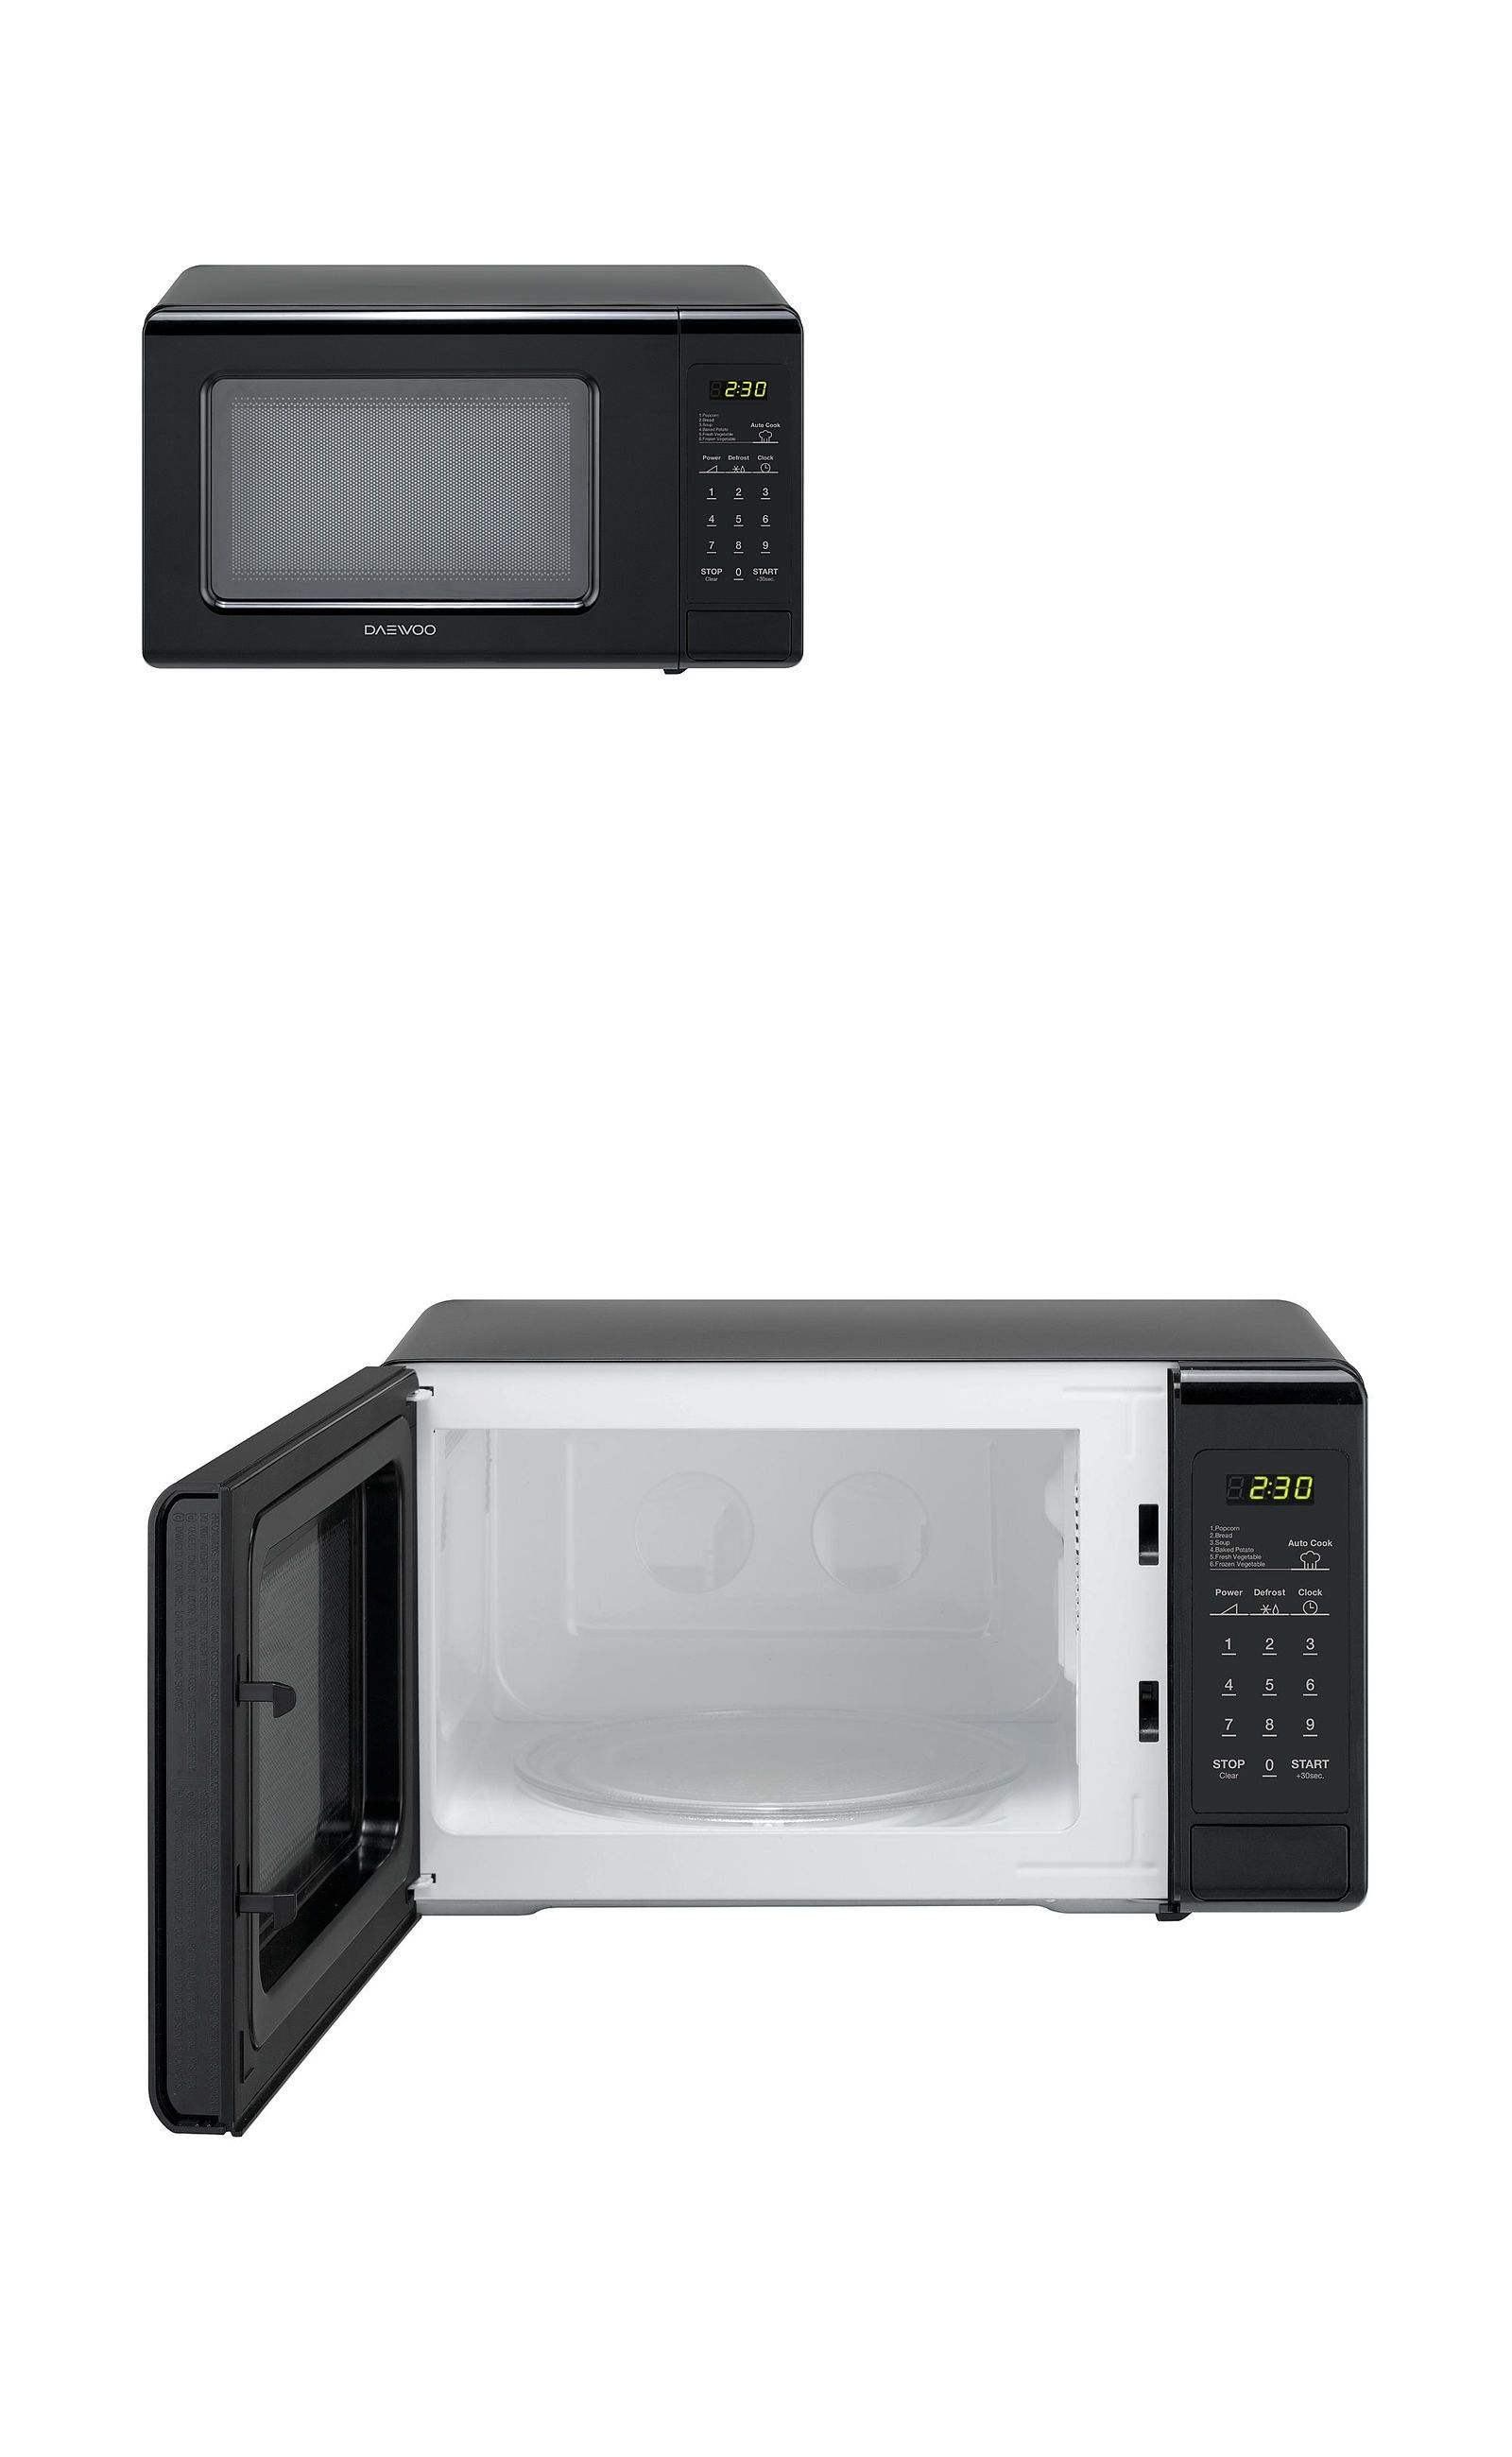 Microwave Ovens 150140 New Daewoo Microwave Black 0 7 Cu Ft